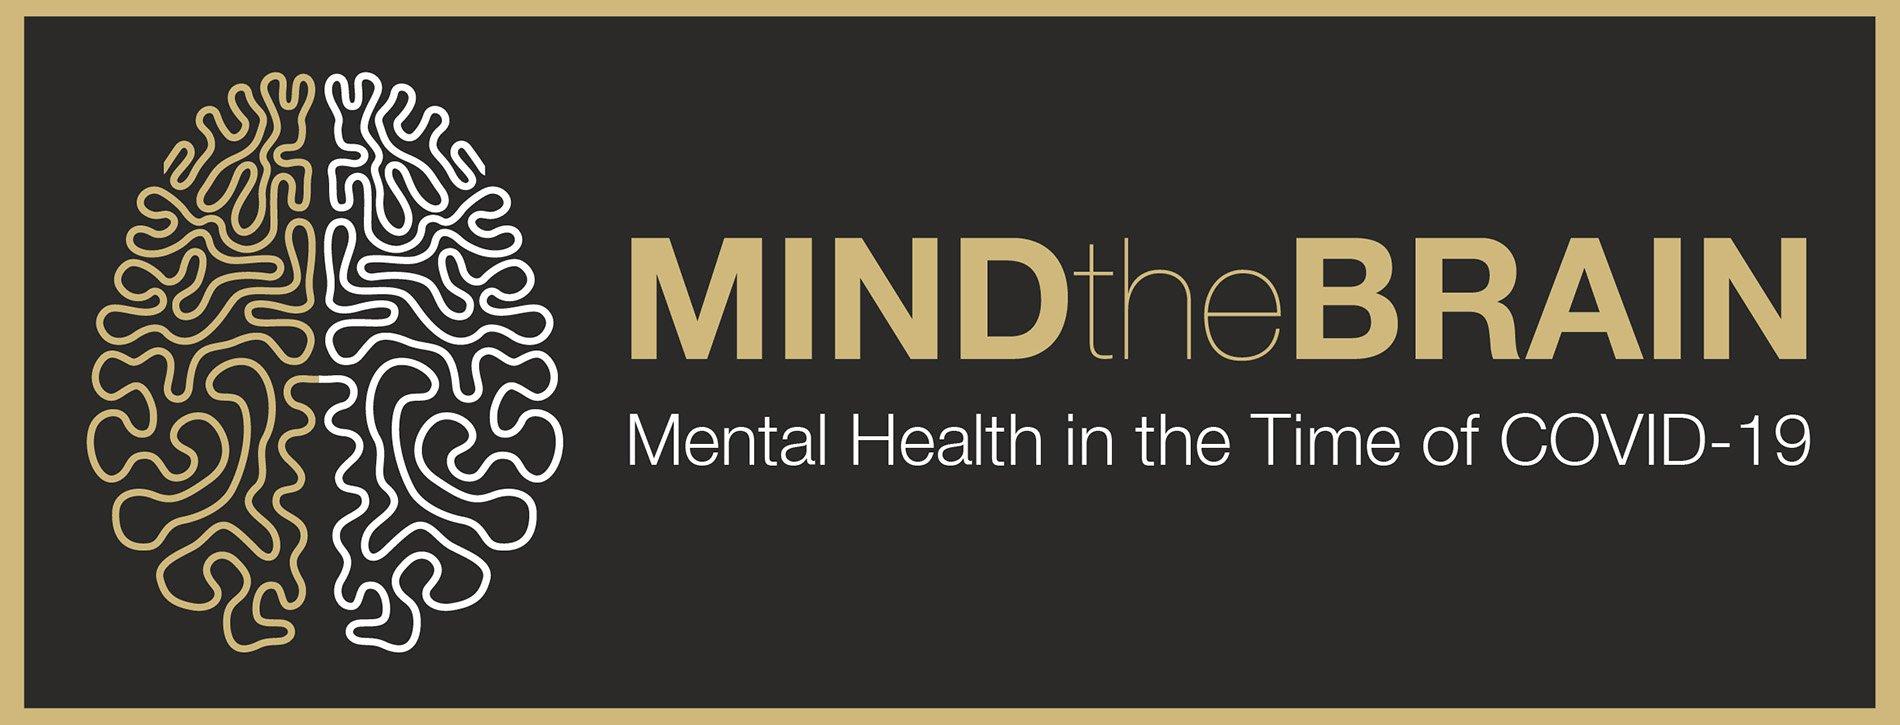 MindTheBrainINS3-1